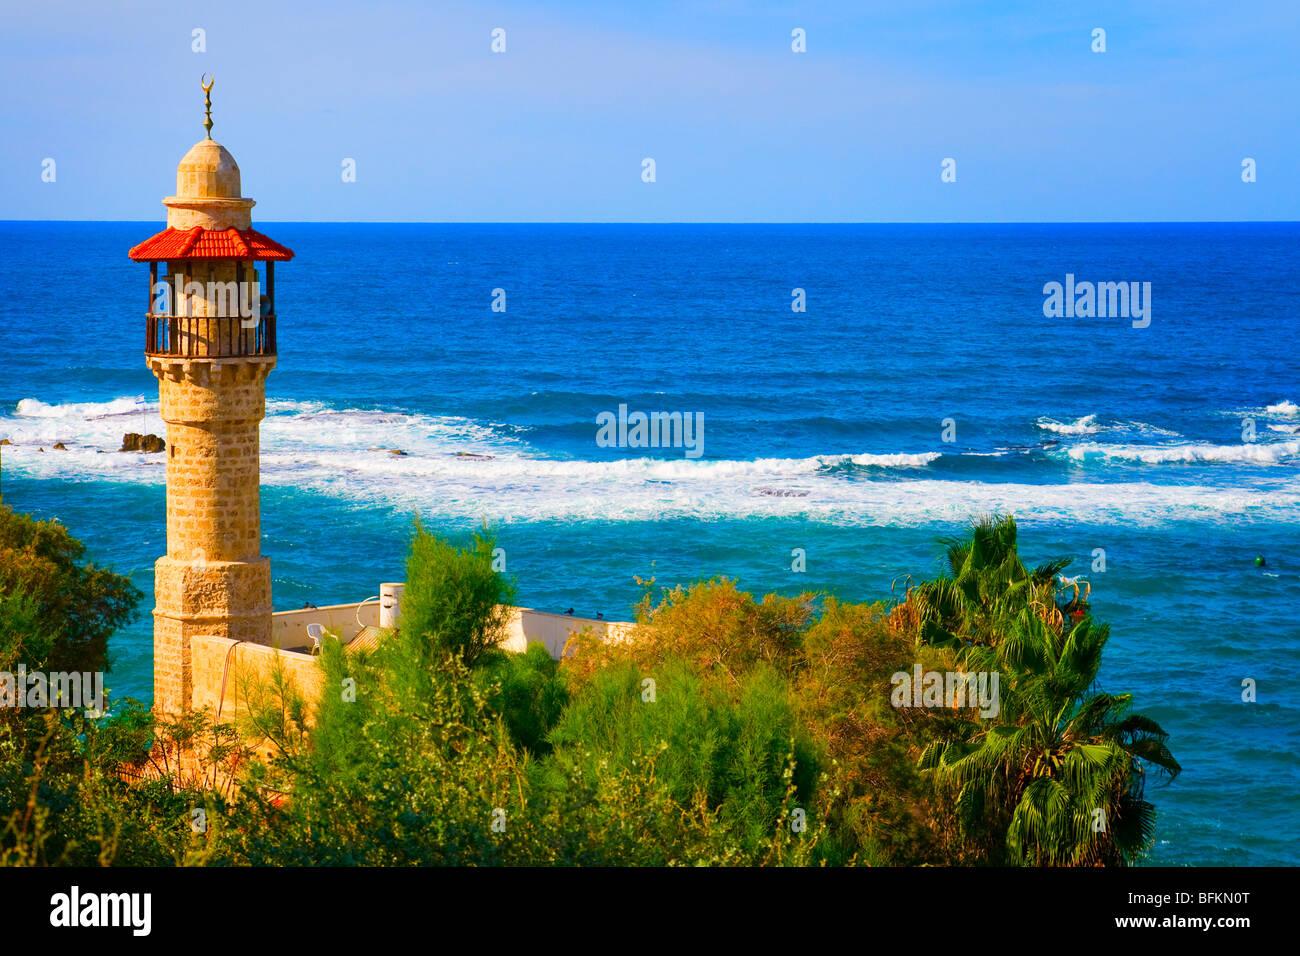 Landscape colorful view from Tel Aviv coastline, Israel - Stock Image